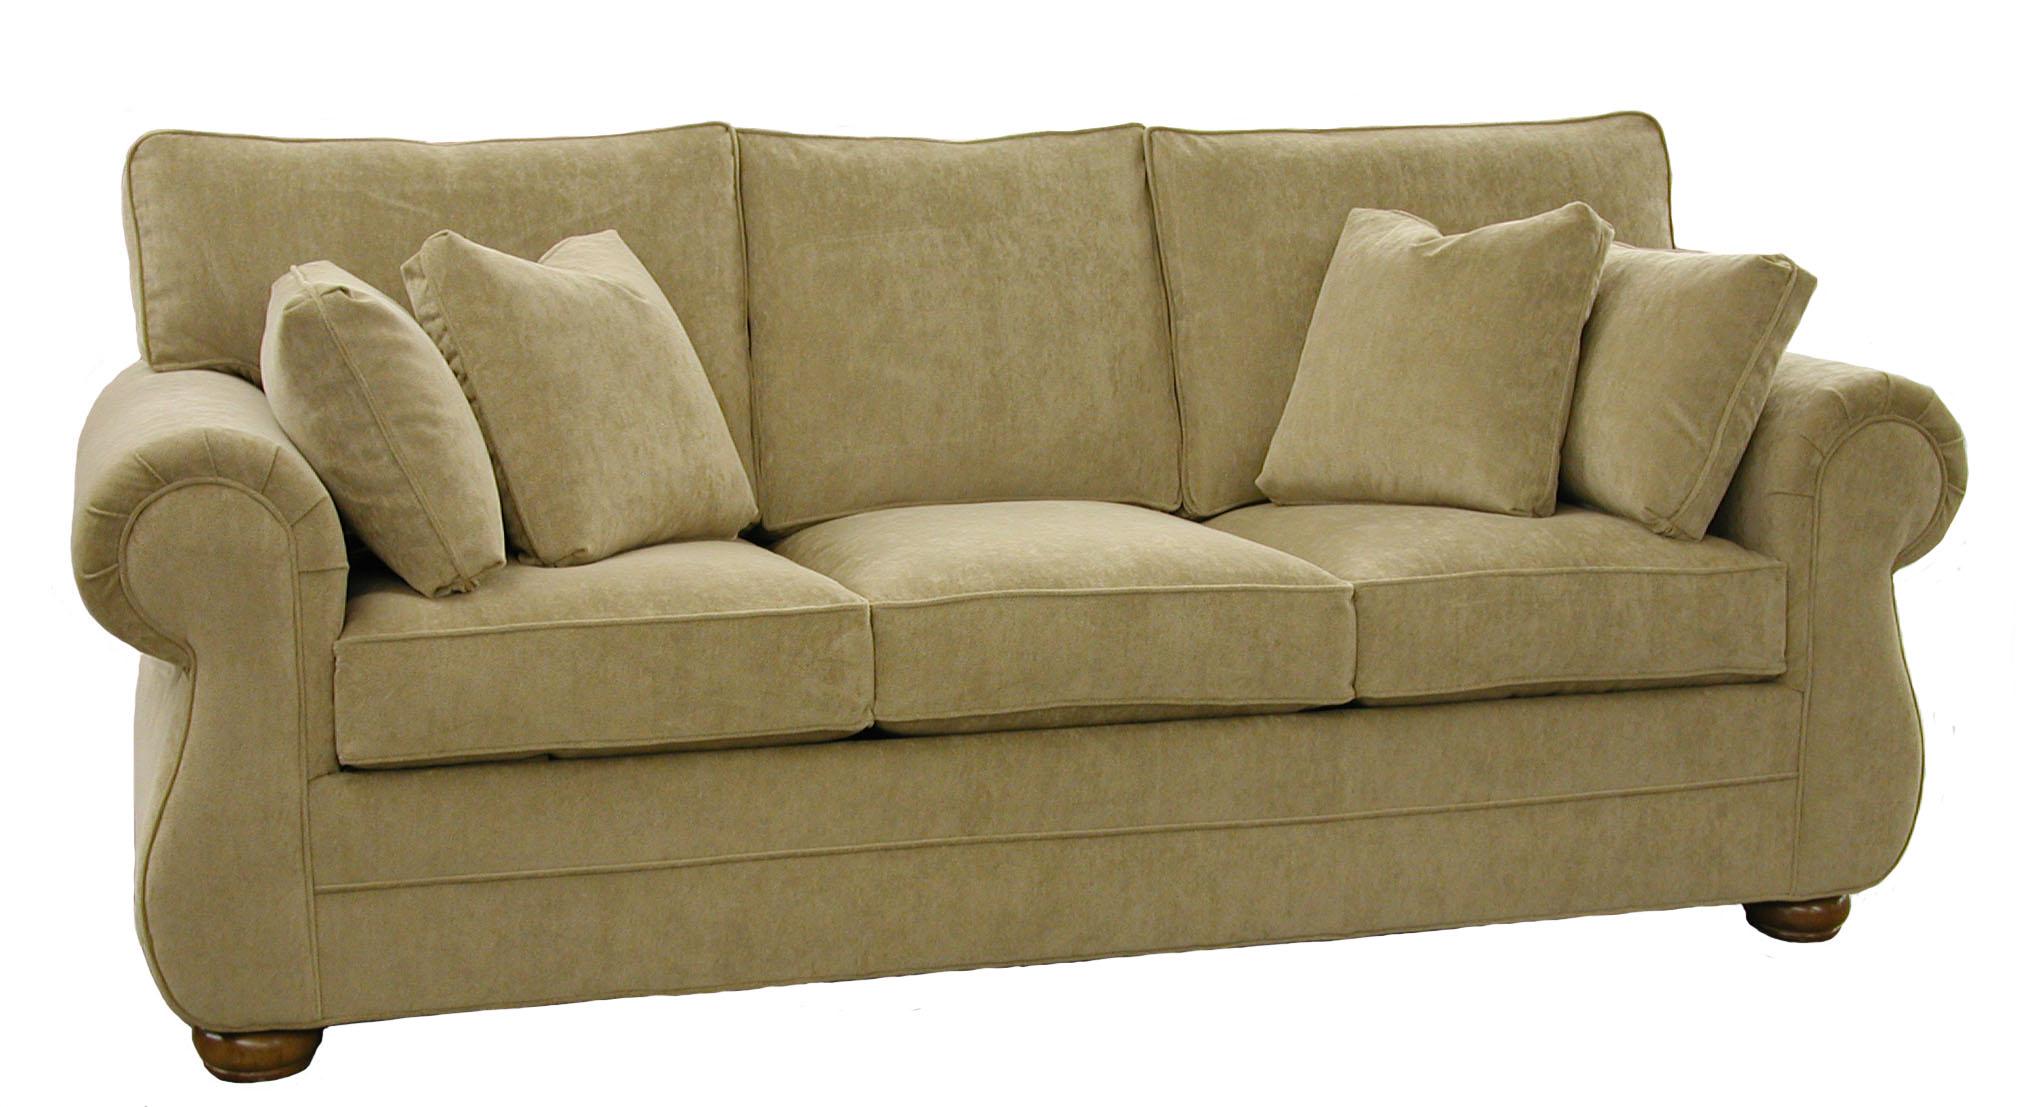 Kingsley Queen Sleeper Sofa Carolina Chair American Made Usa Nc Furniture Free Shipping